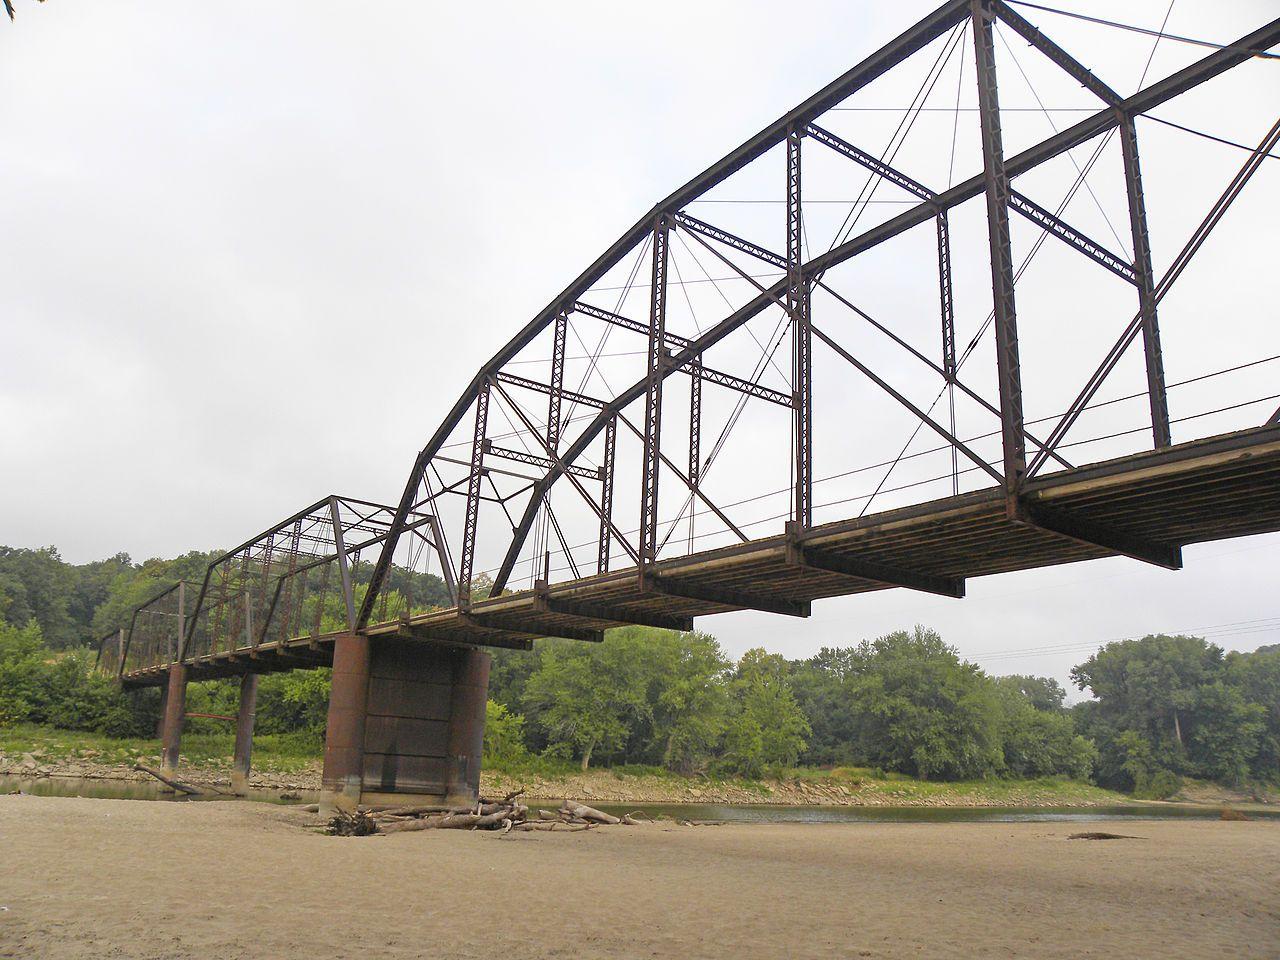 Boone Bridge 2 in Boone County, Iowa.